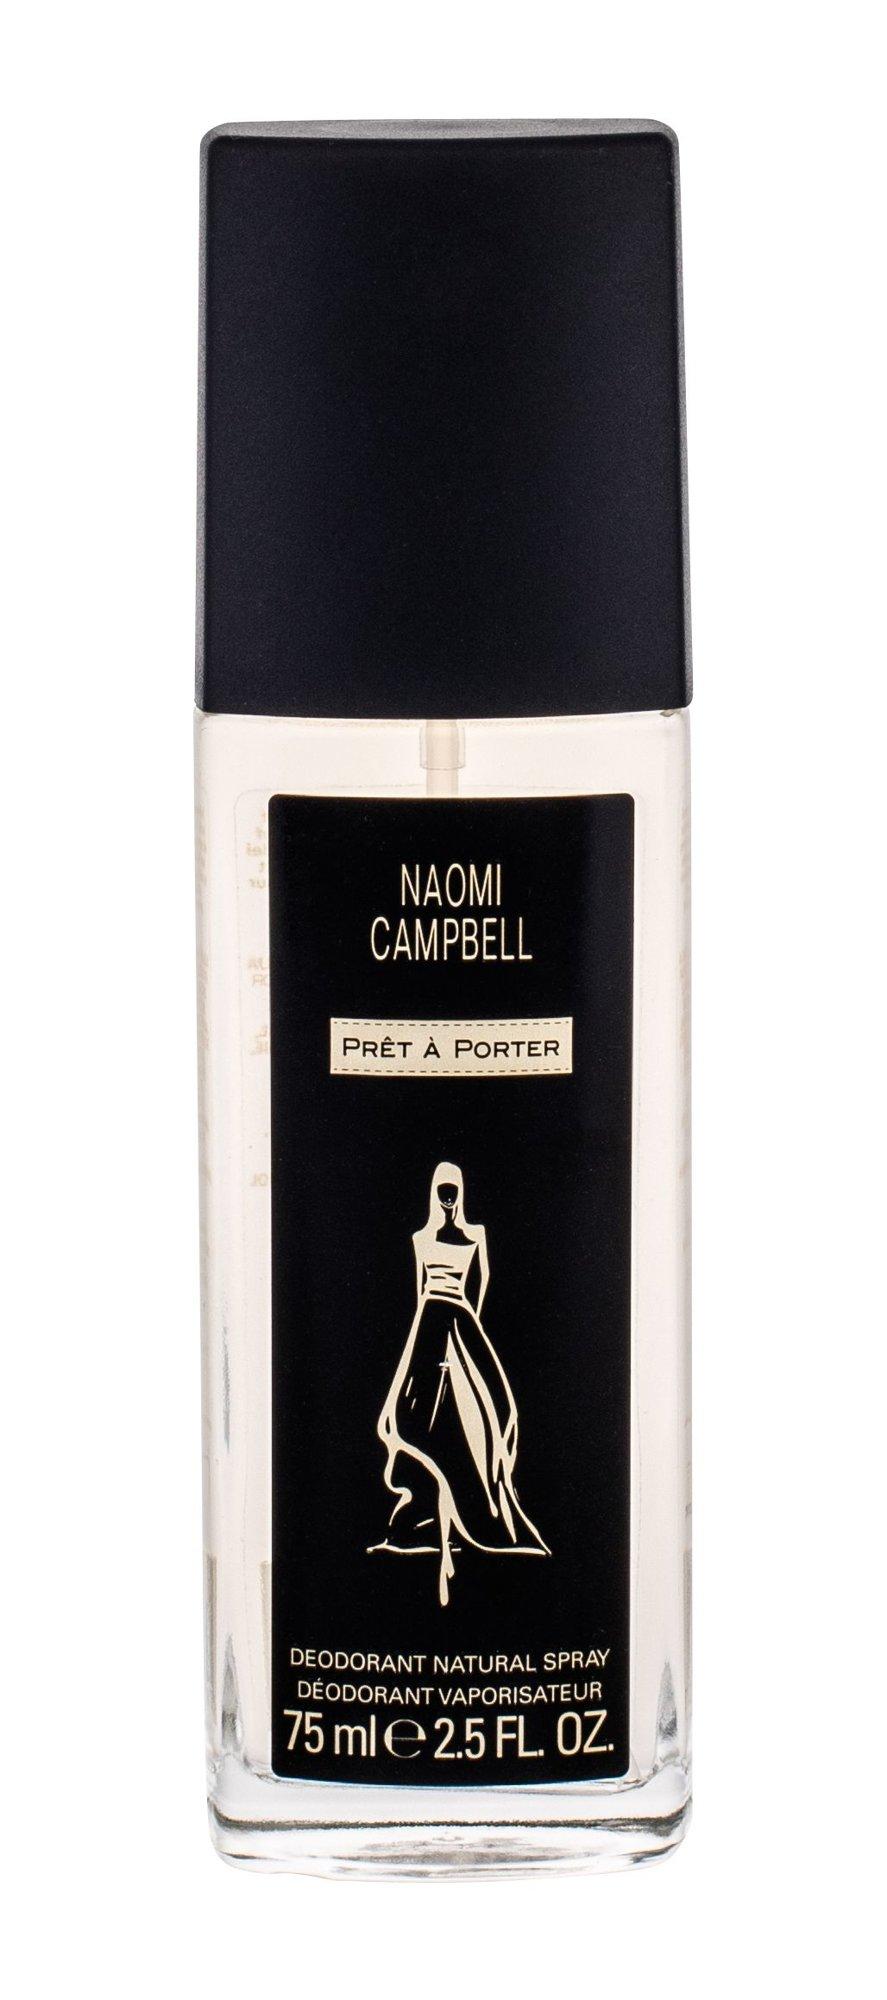 Naomi Campbell Pret a Porter Deodorant 75ml